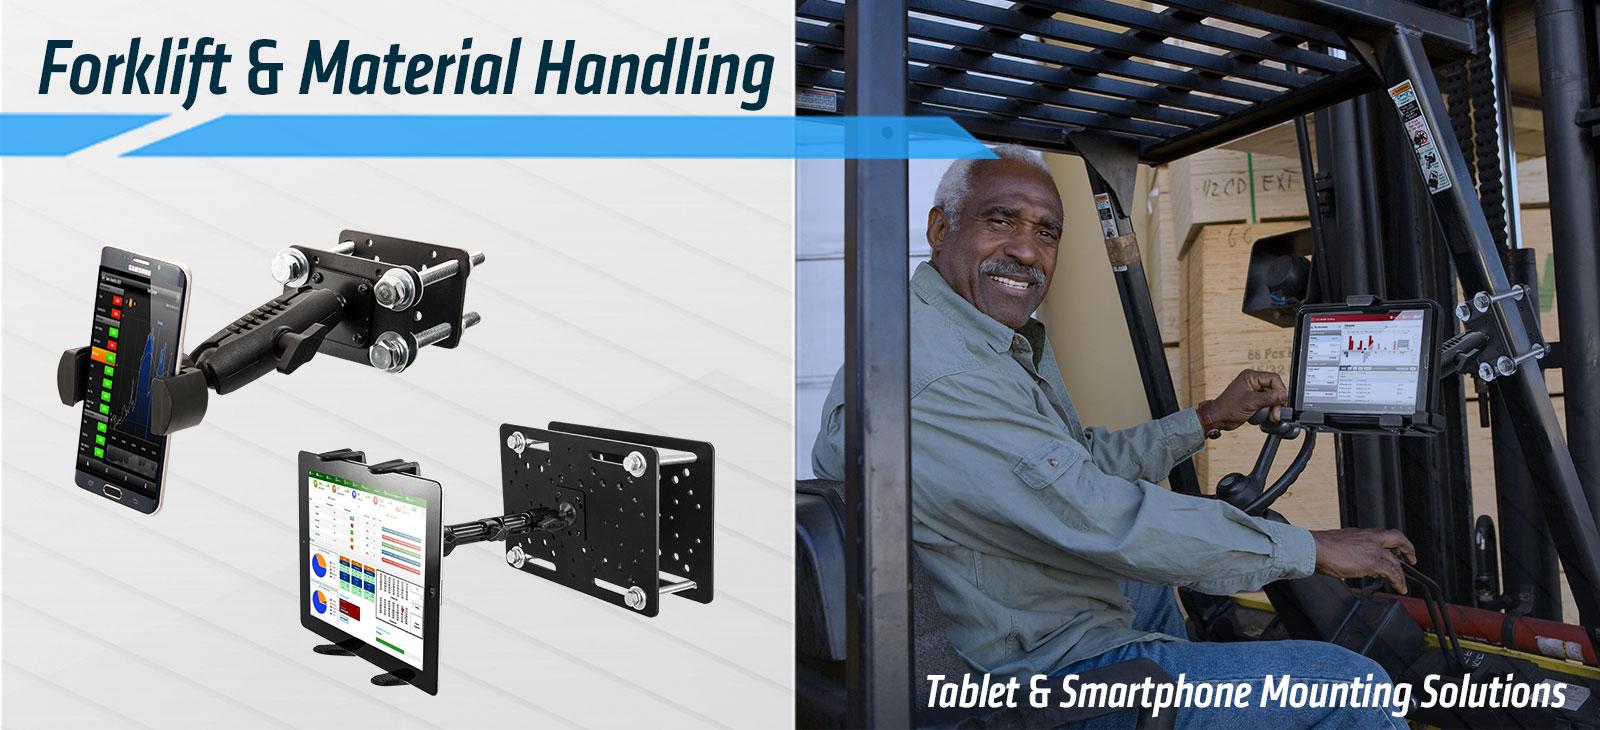 Arkon Mounts - The Tablet Mounting Specialists - Heavy-Duty